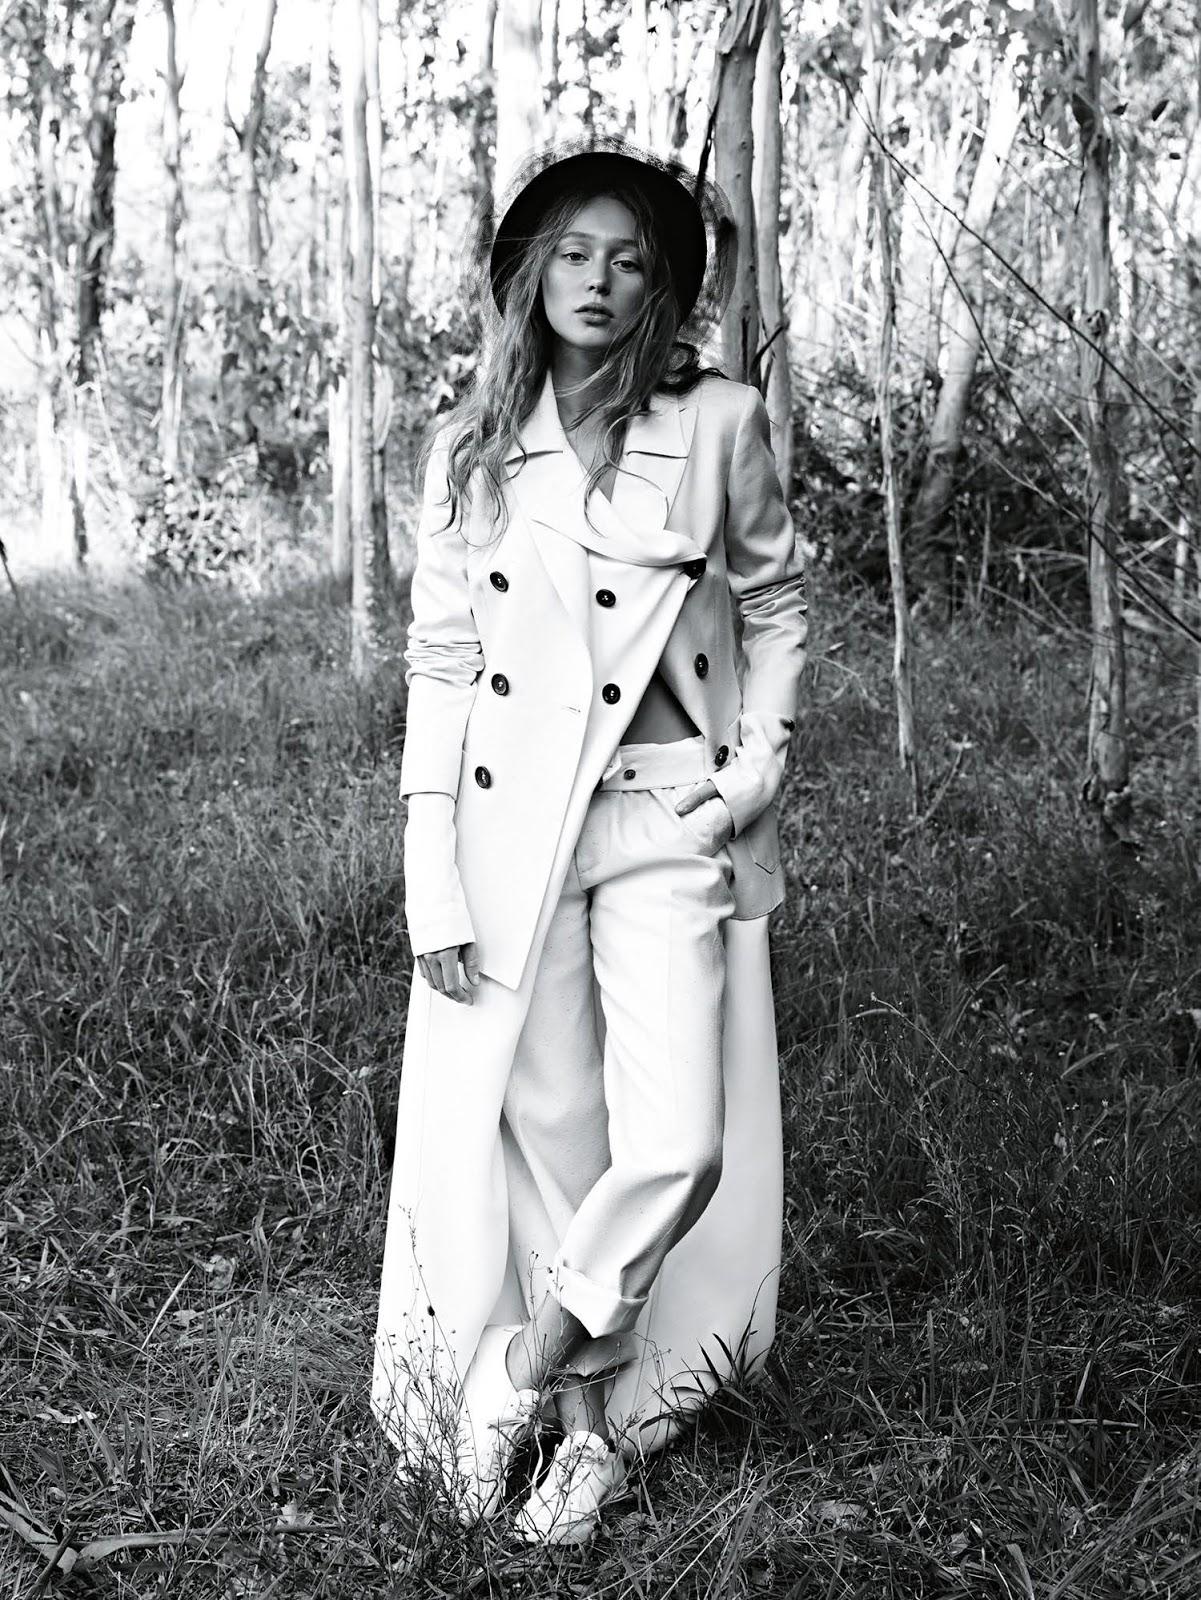 Alycia Debham in Vogue Australia May 2016 (photography: Nicole Bentley, styling: Meg Gray) via www.fashionedbylove.co.uk british fashion blog